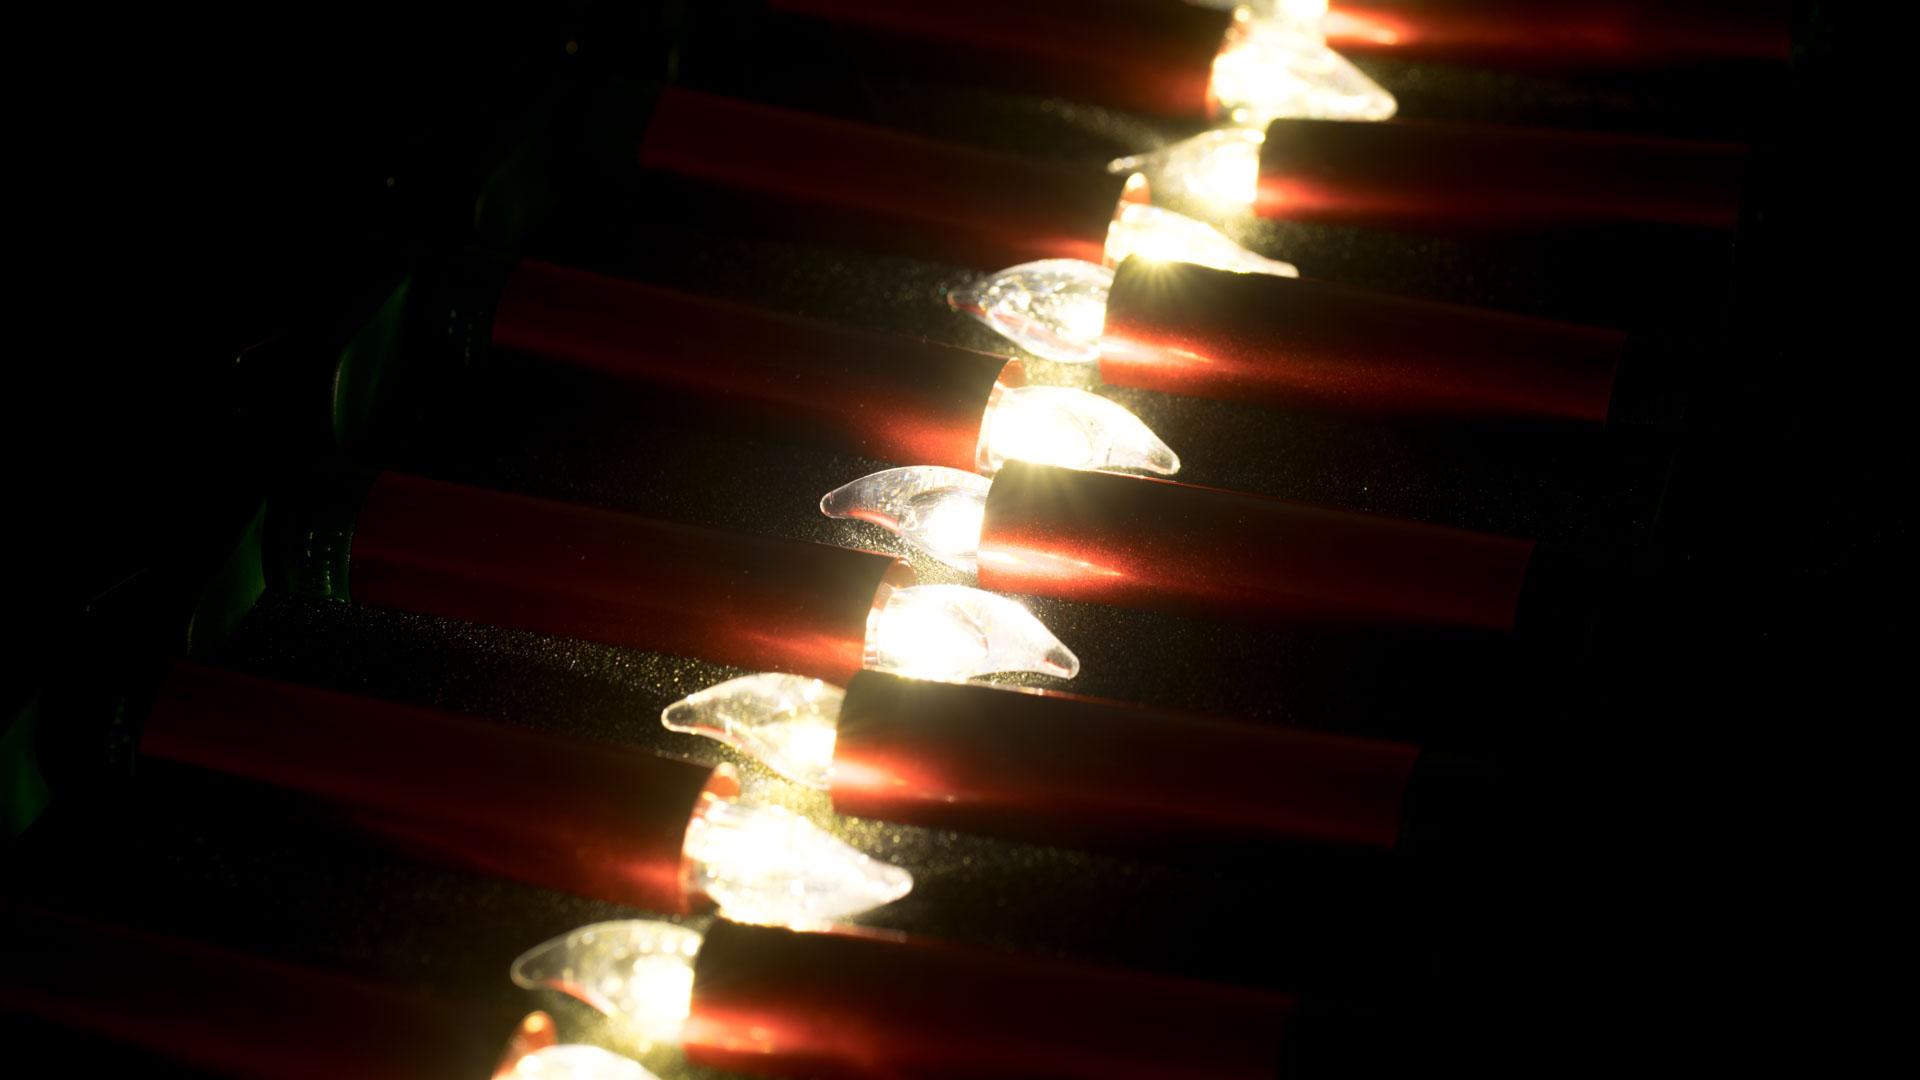 KRINNER-Lumix-Deluxe-Mini-Basis-Set-rot-IR-kabellose-LED-Christbaumkerzen-11 Schöne Kerze Leuchtet In Verschiedenen Farben Dekorationen